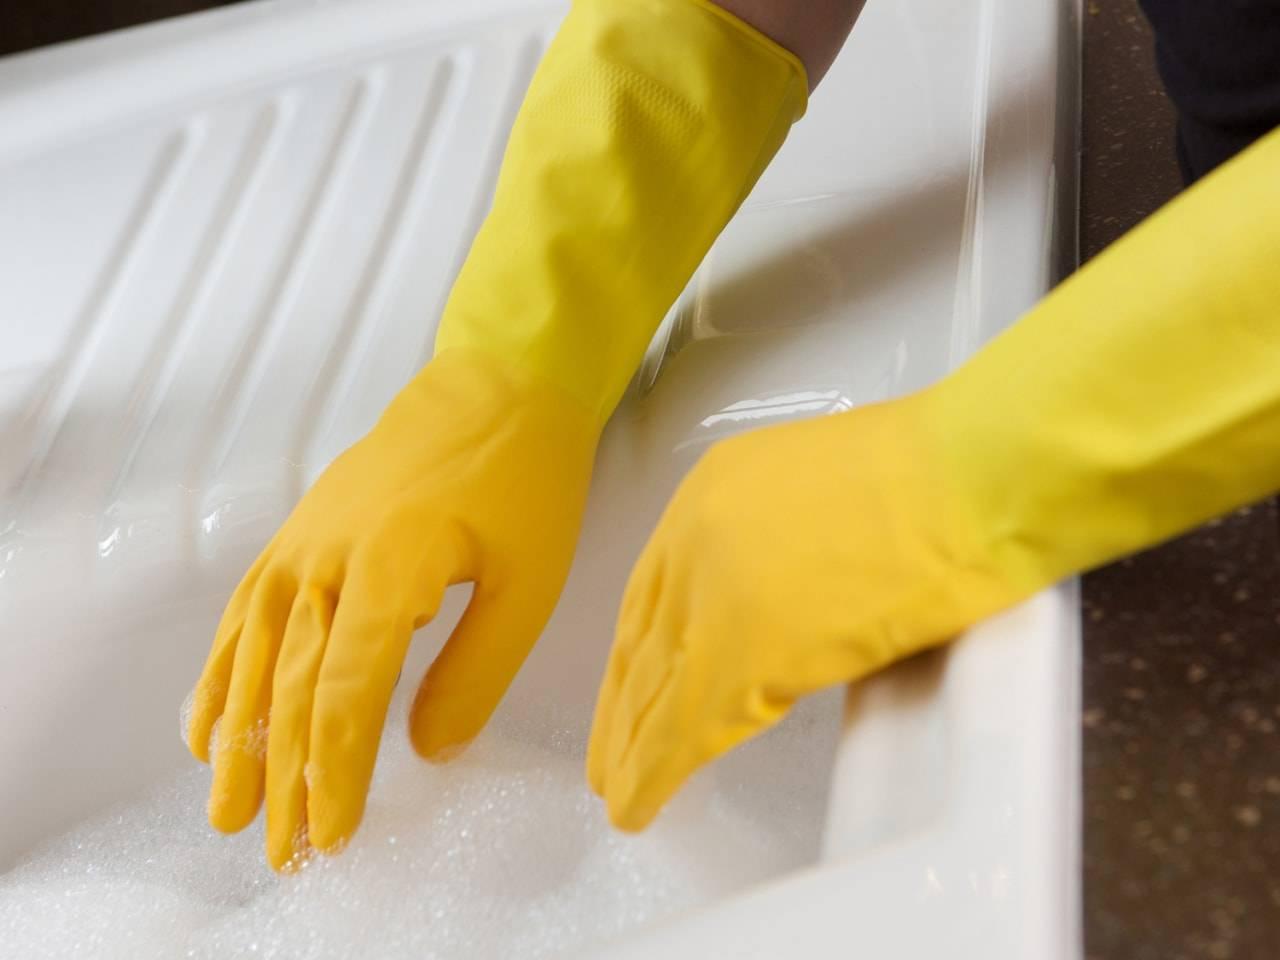 Marigold Extra Life Gloves Kitchen Large 1 X Pack Marigold Gloves